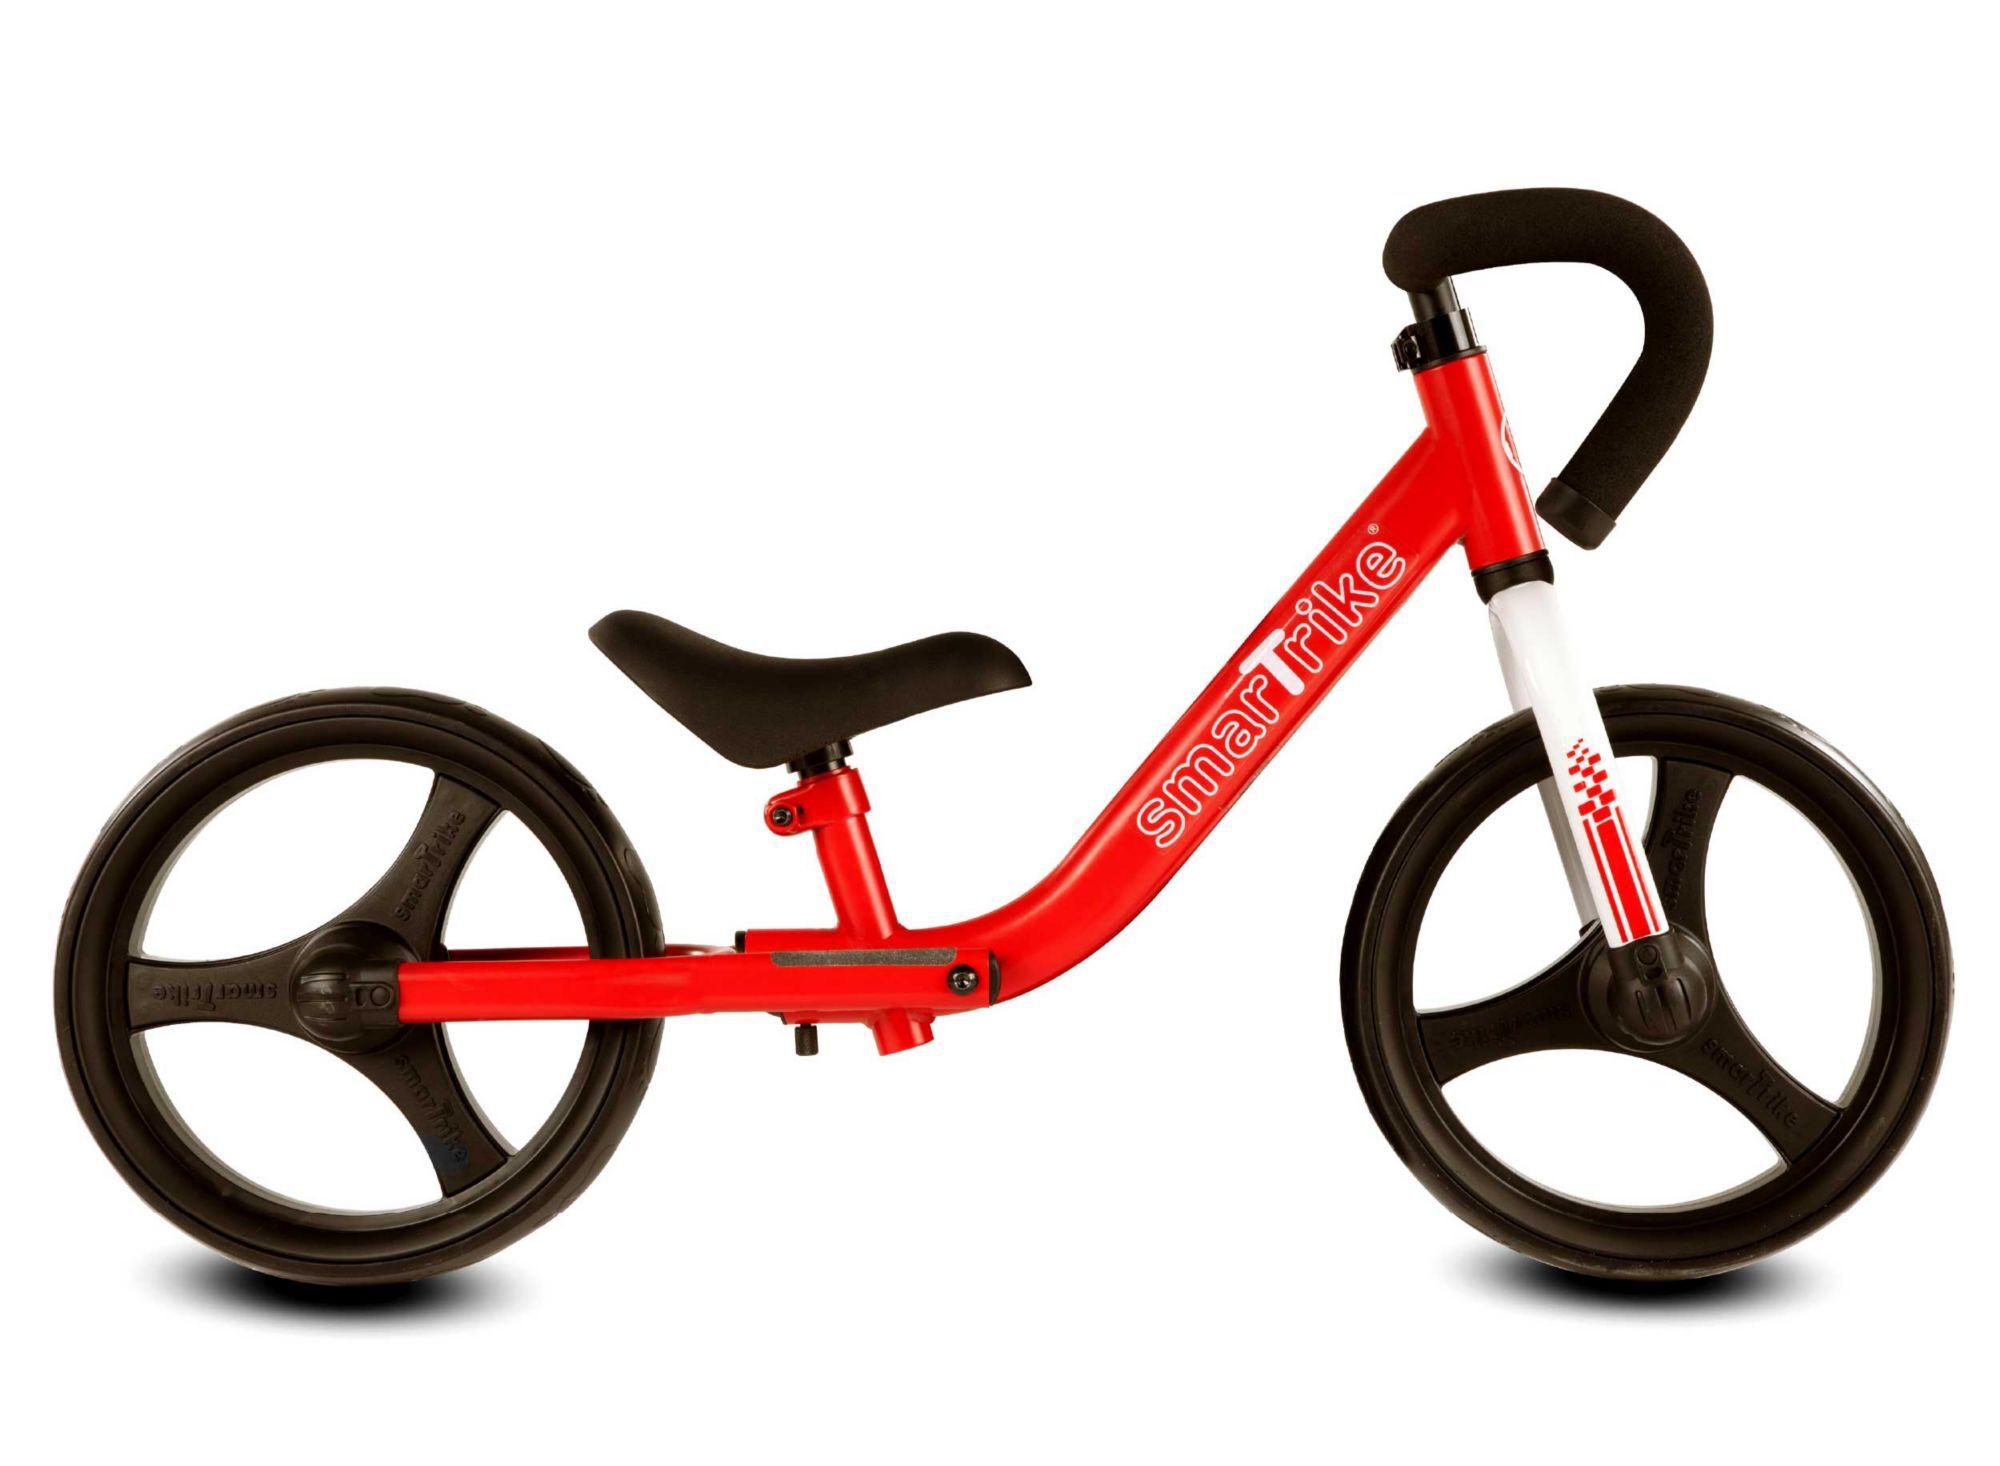 SmarTrike Folding Balance Bike, Red